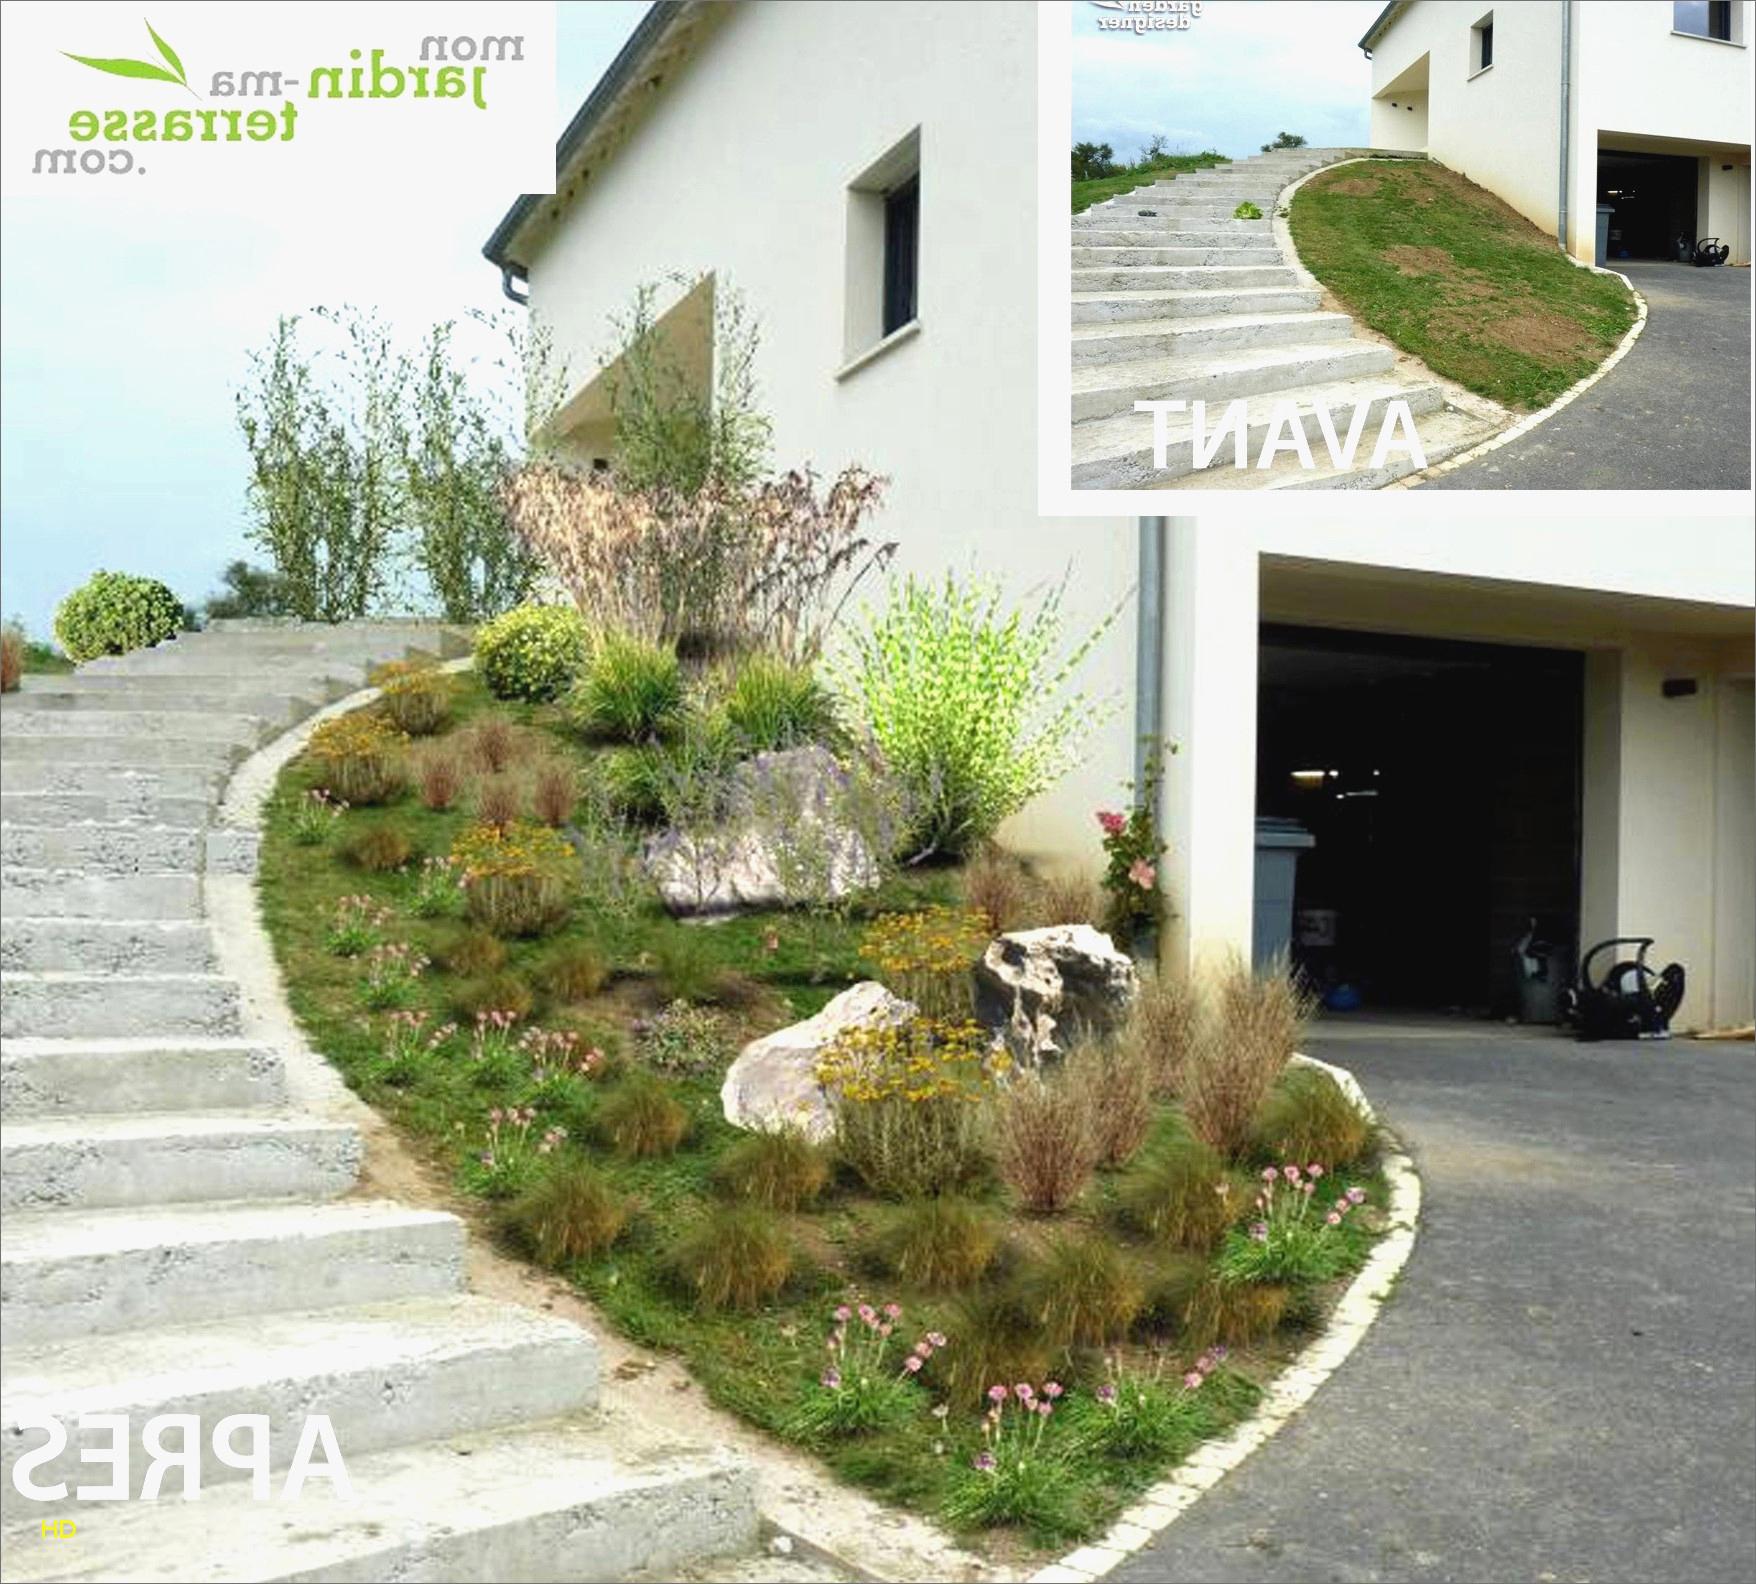 Logiciel Amã©Nagement Jardin Logiciel Paysagiste 3D encequiconcerne Logiciel Paysagiste Gratuit